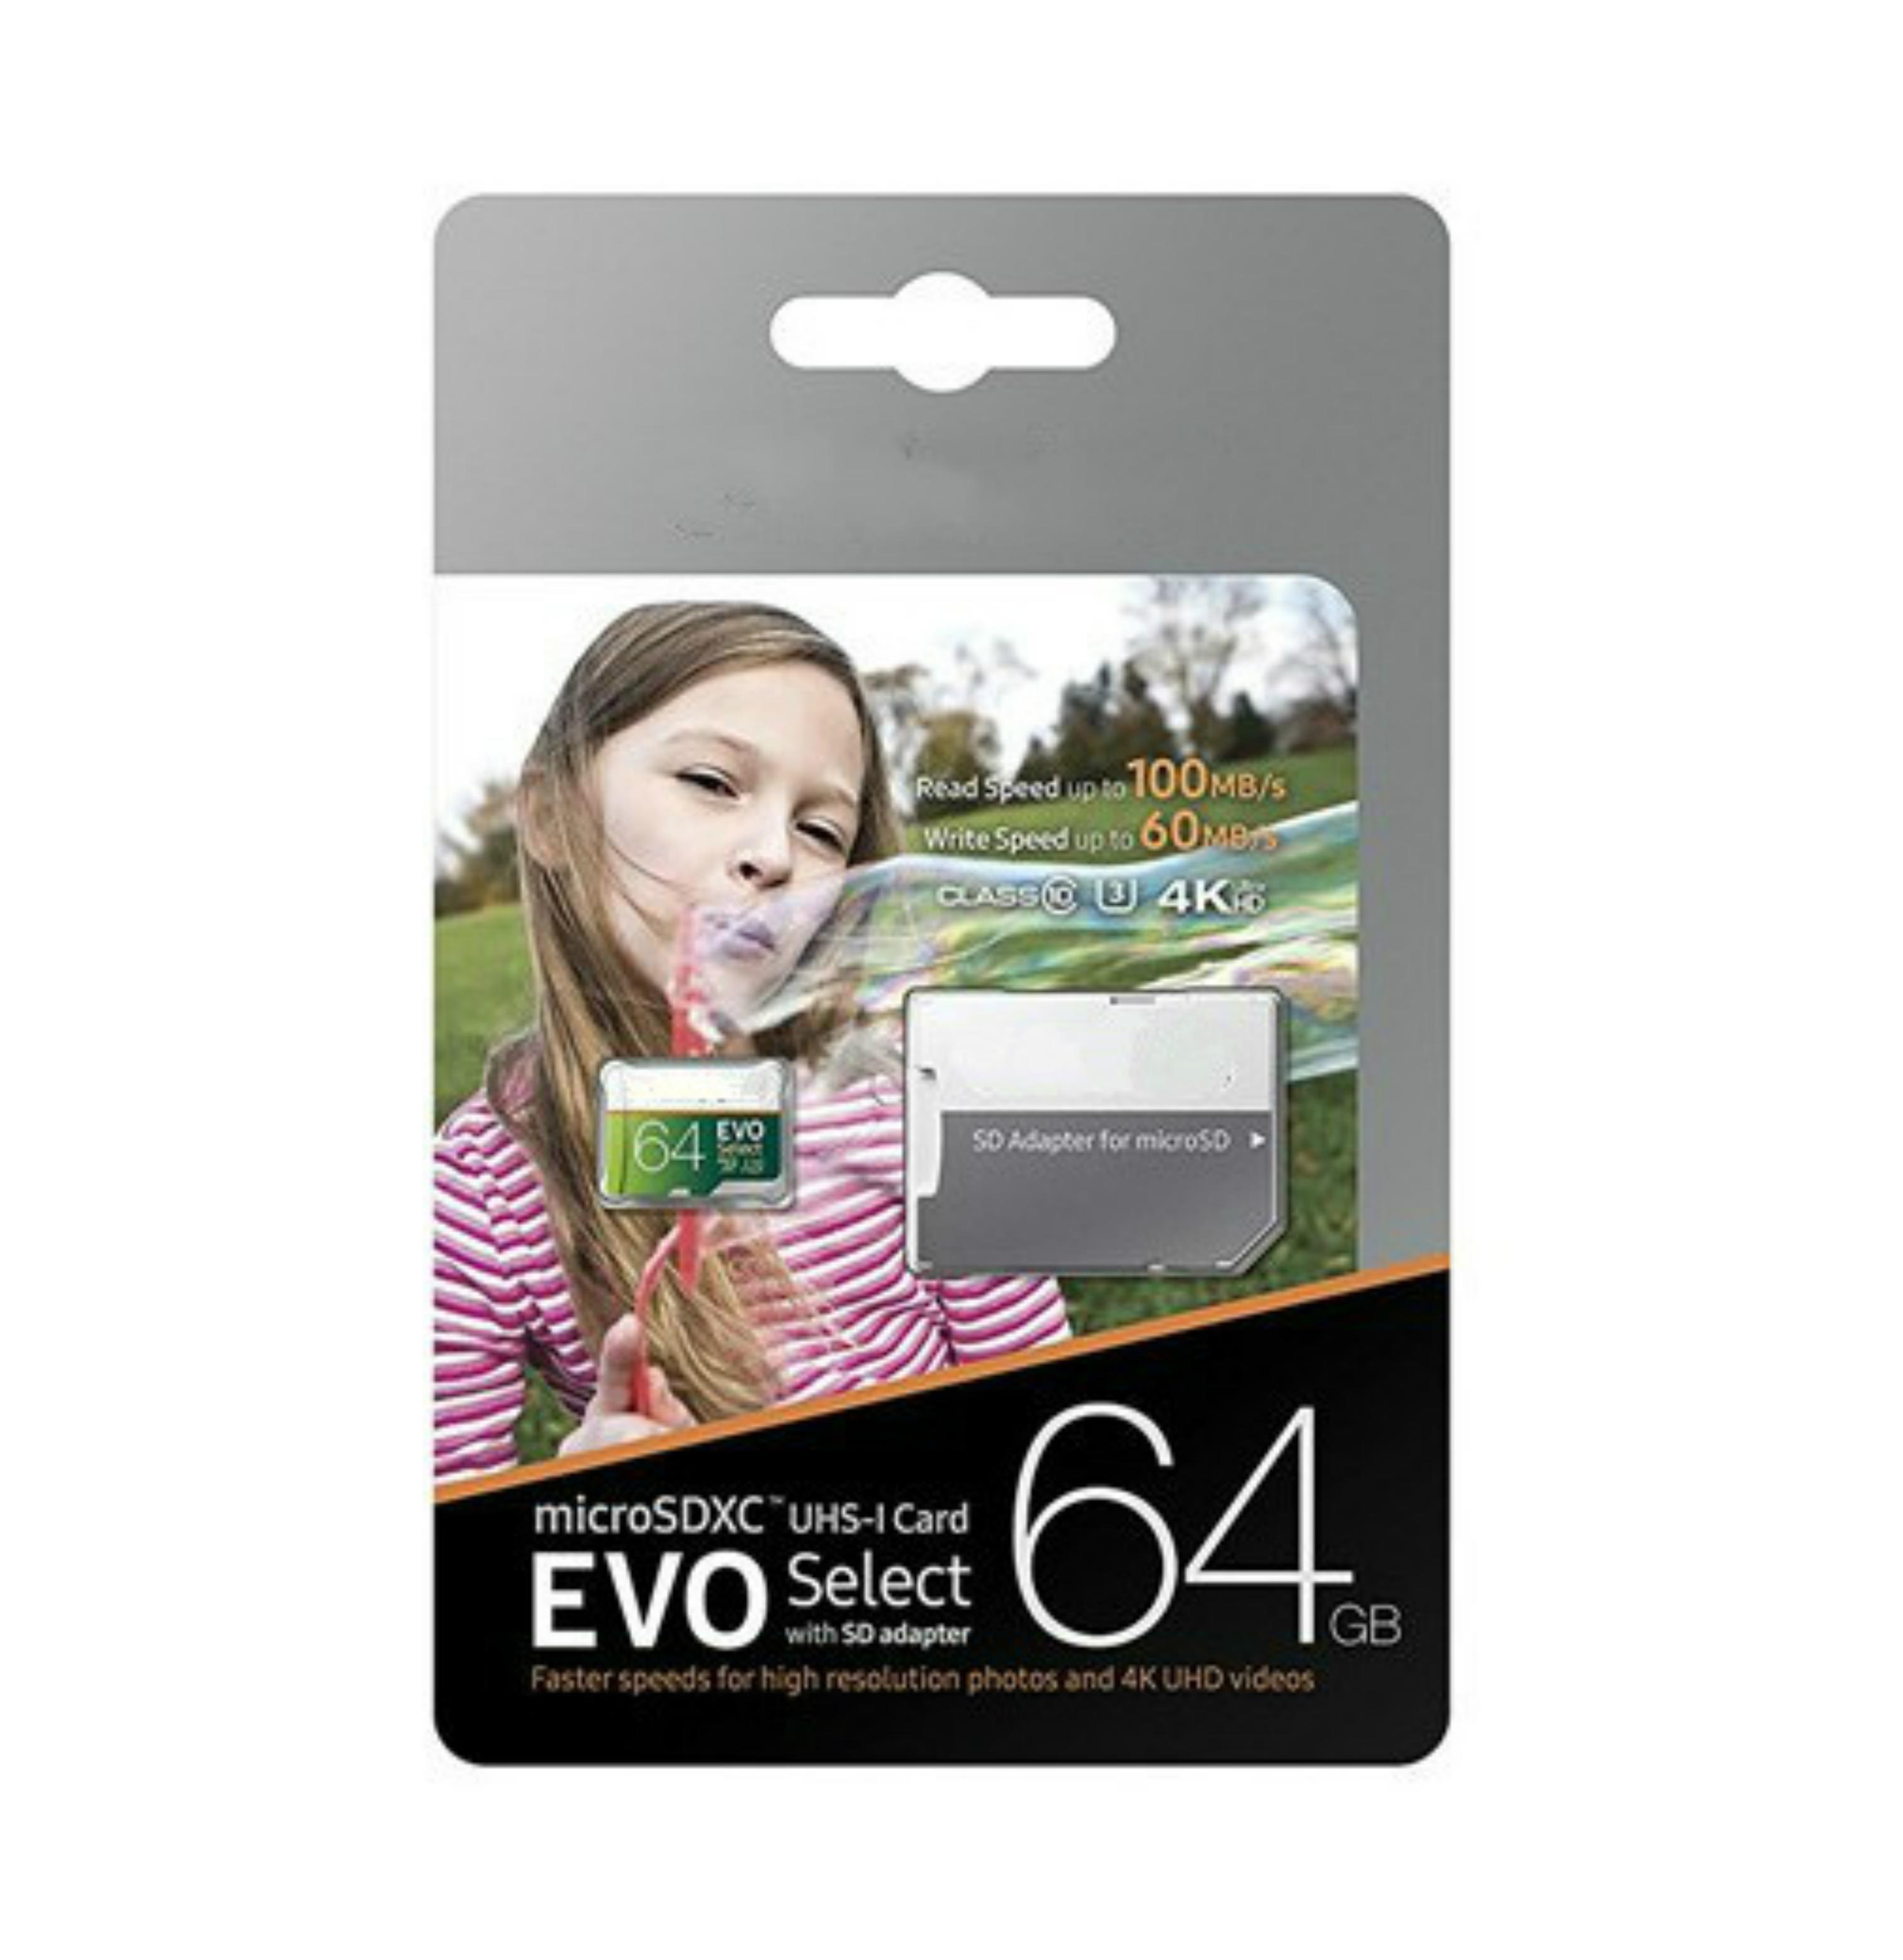 32GB / 64GB / 128GB / 256GB Samsung Evo Выбрать карту Micro SD / смартфон Карту для хранения / карта автомобиля TF Card / Камельная карта памяти 100 МБ / с